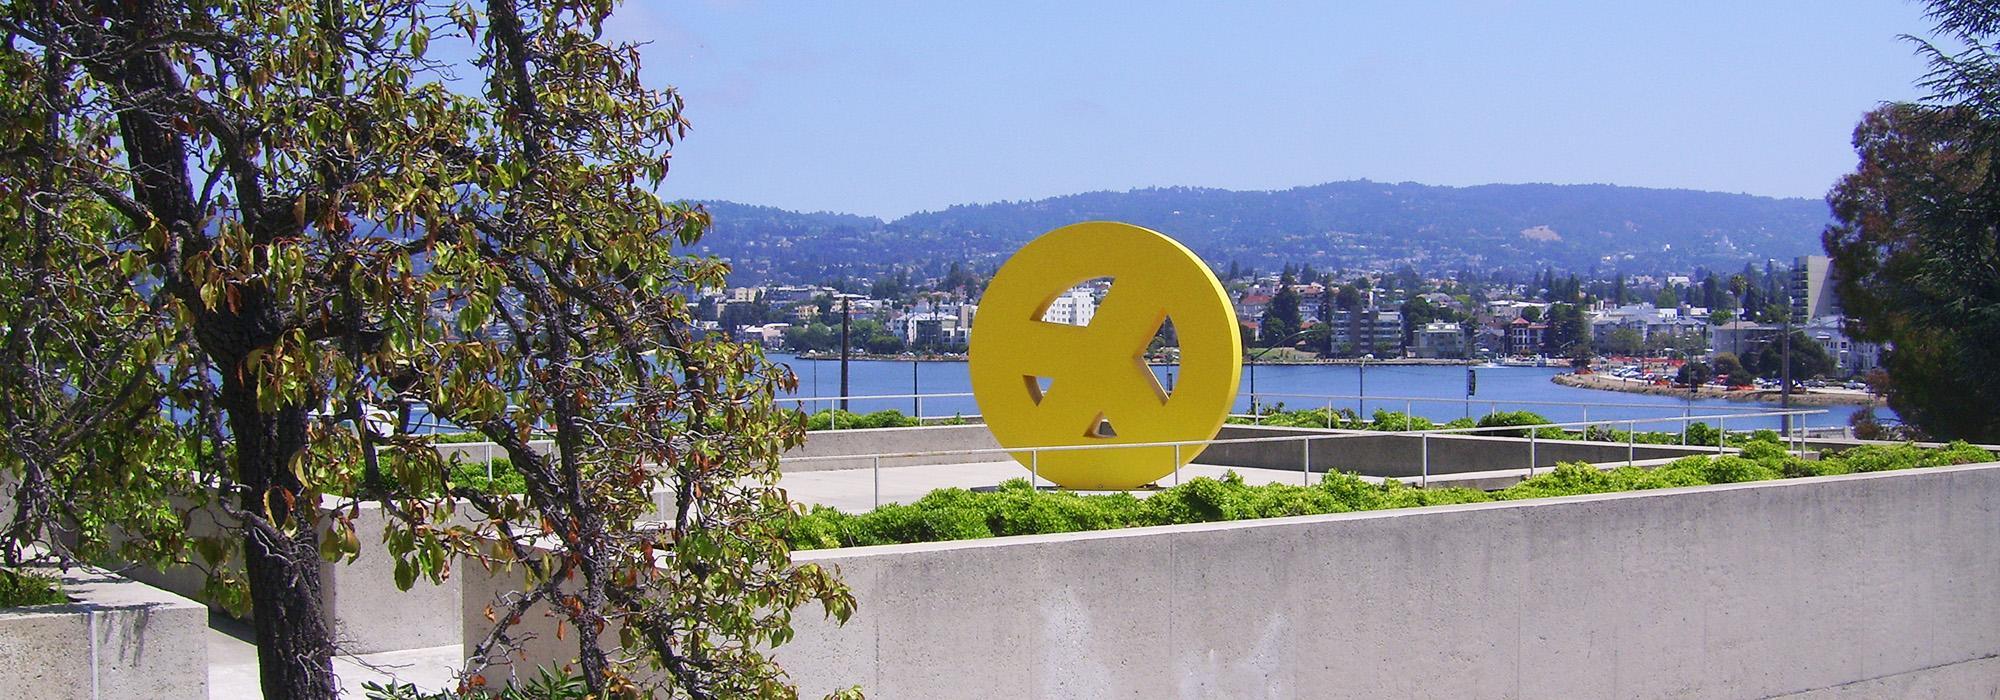 CA_Oakland_OaklandMuseumofCA_02_NancyCoulter_2011_Hero.jpg